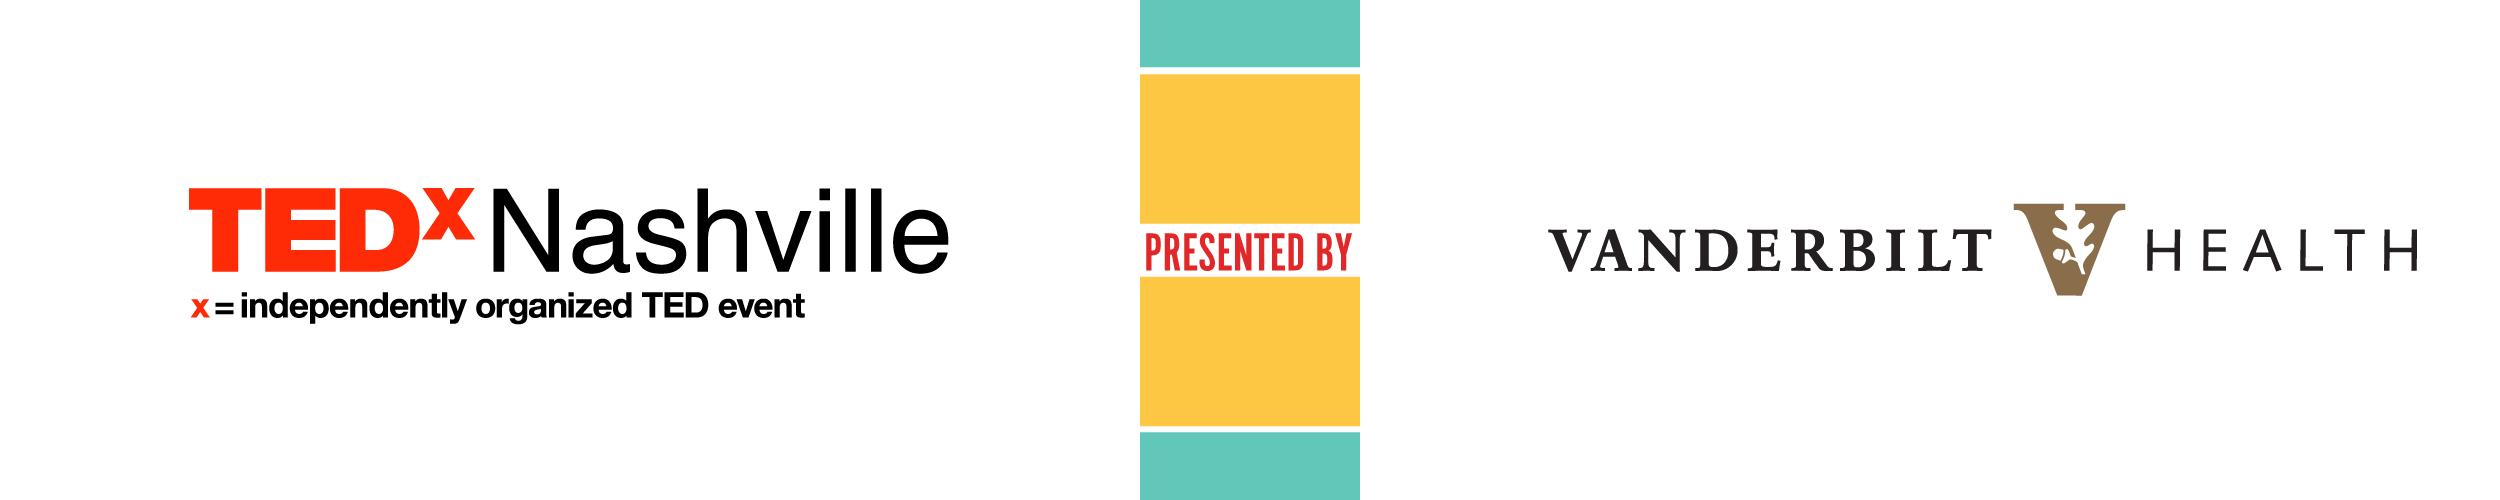 TEDxNashville presented by Vanderbilt Health